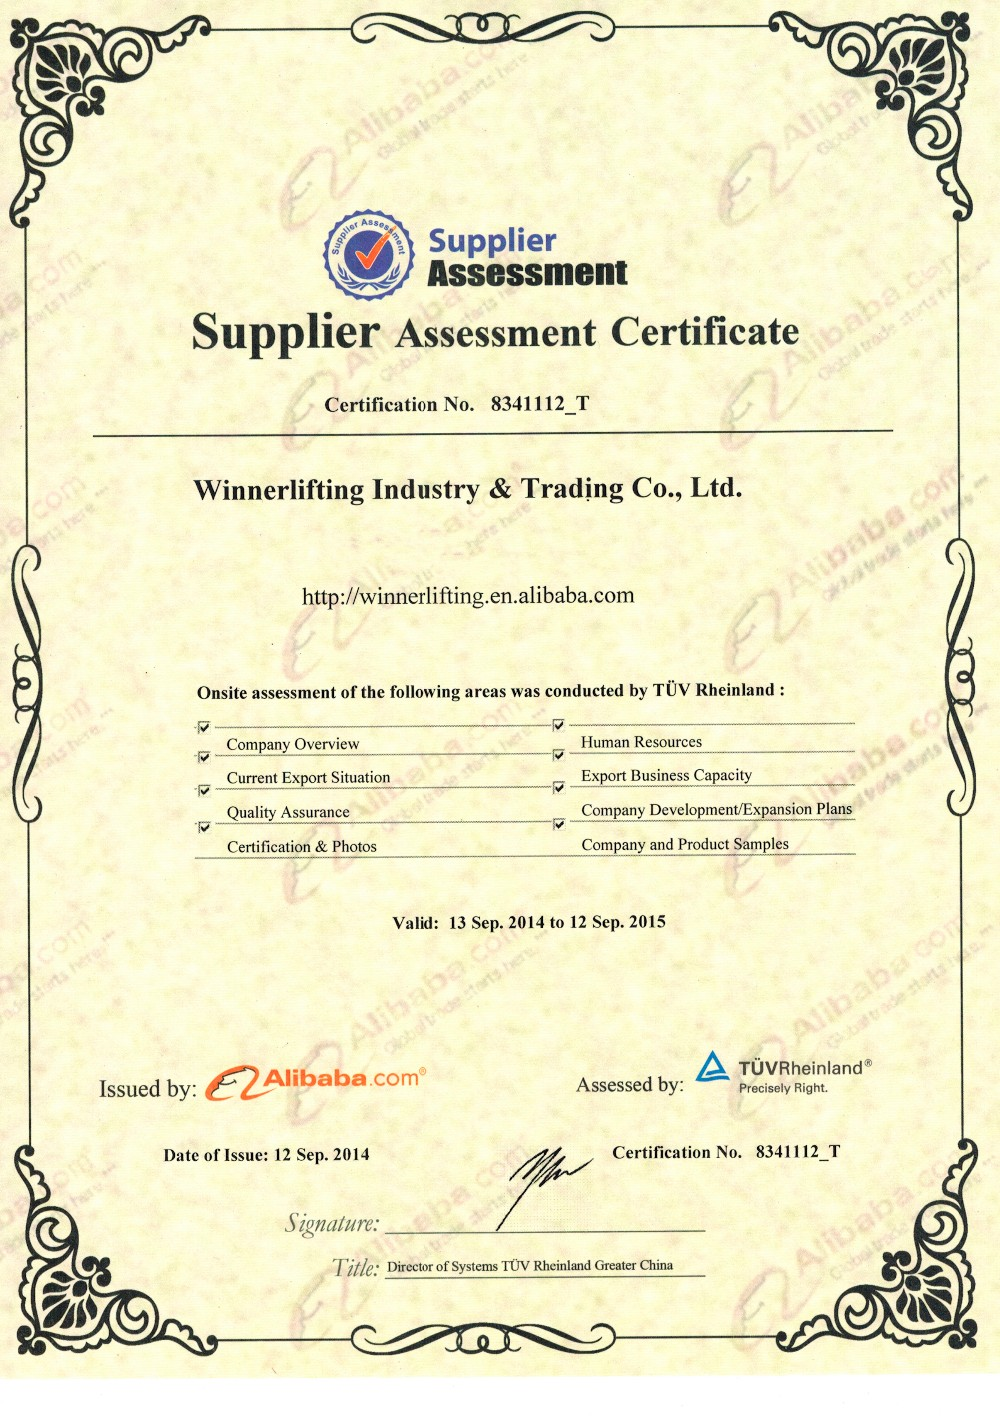 Assessment Certificate from Alibaba.jpg